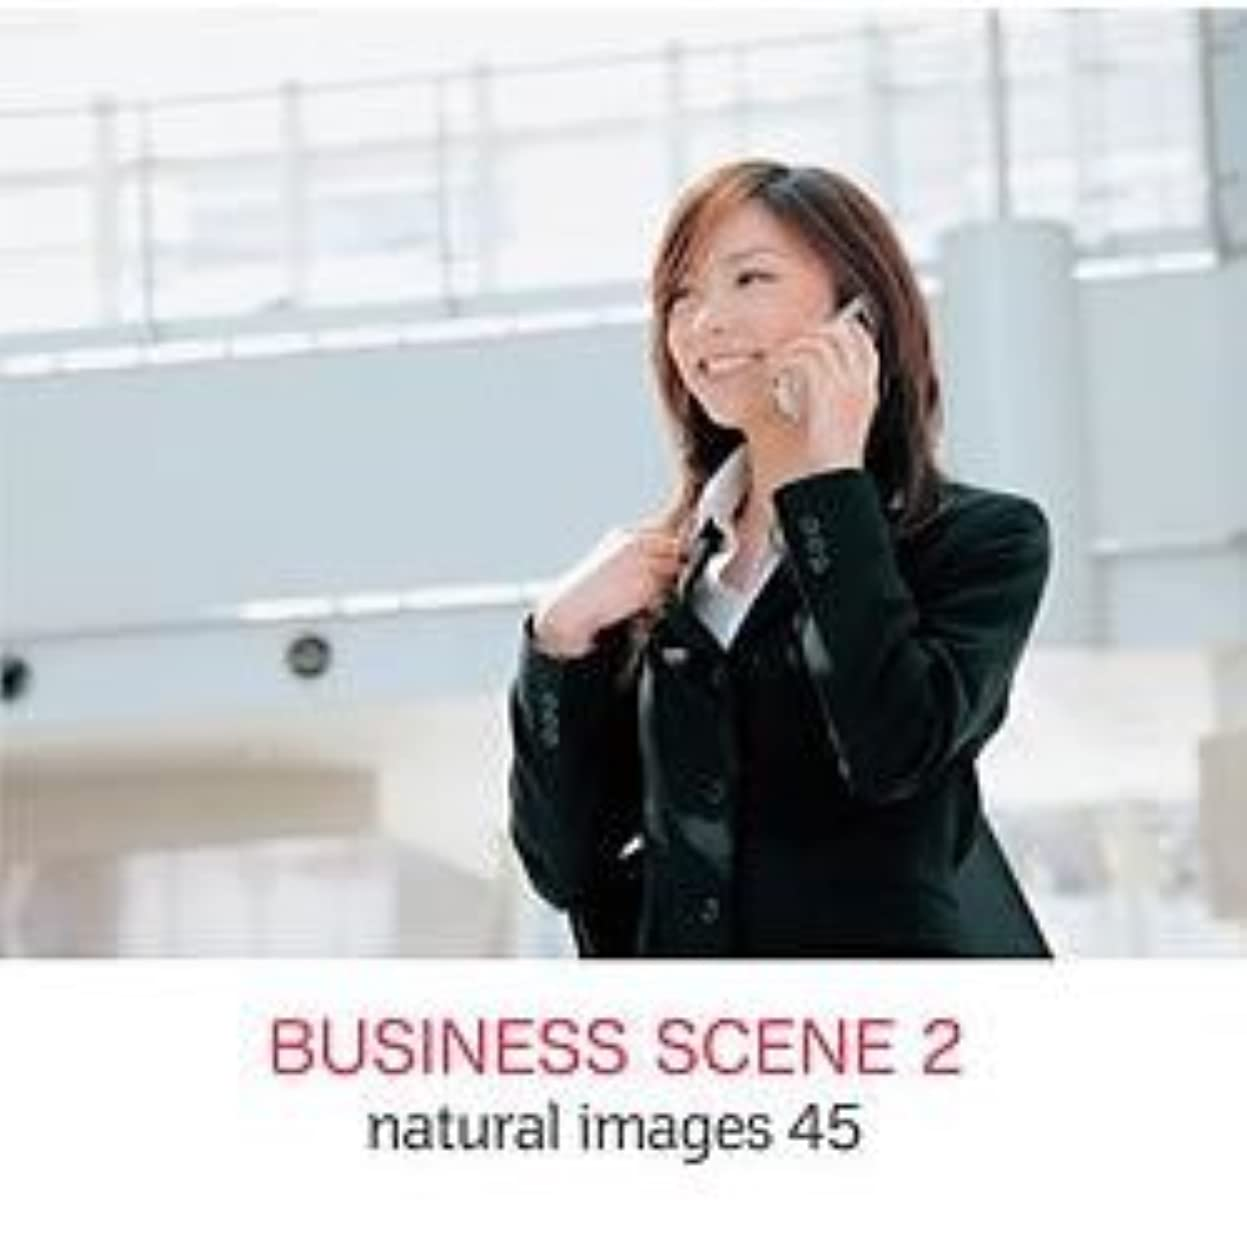 natural images Vol.45 BUSINESS SCENE 2